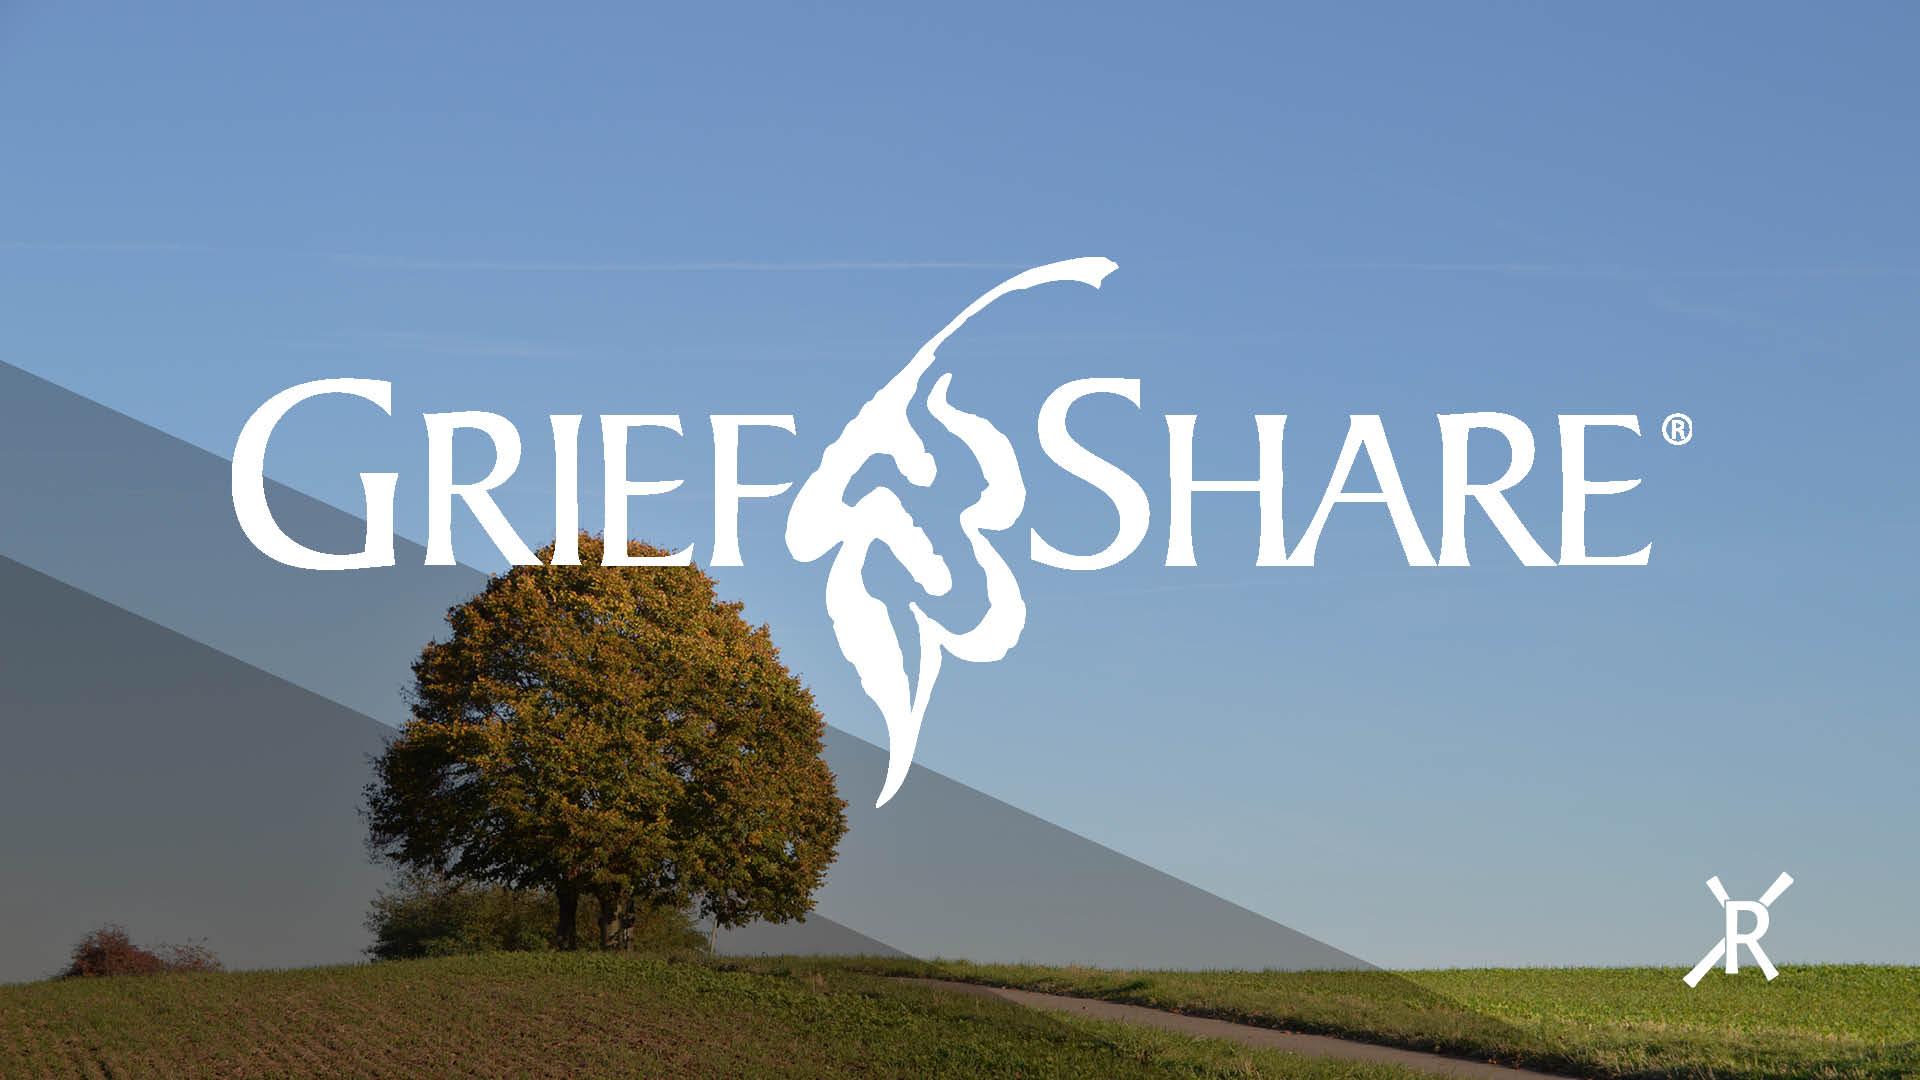 CR_website_Griefshare.jpg